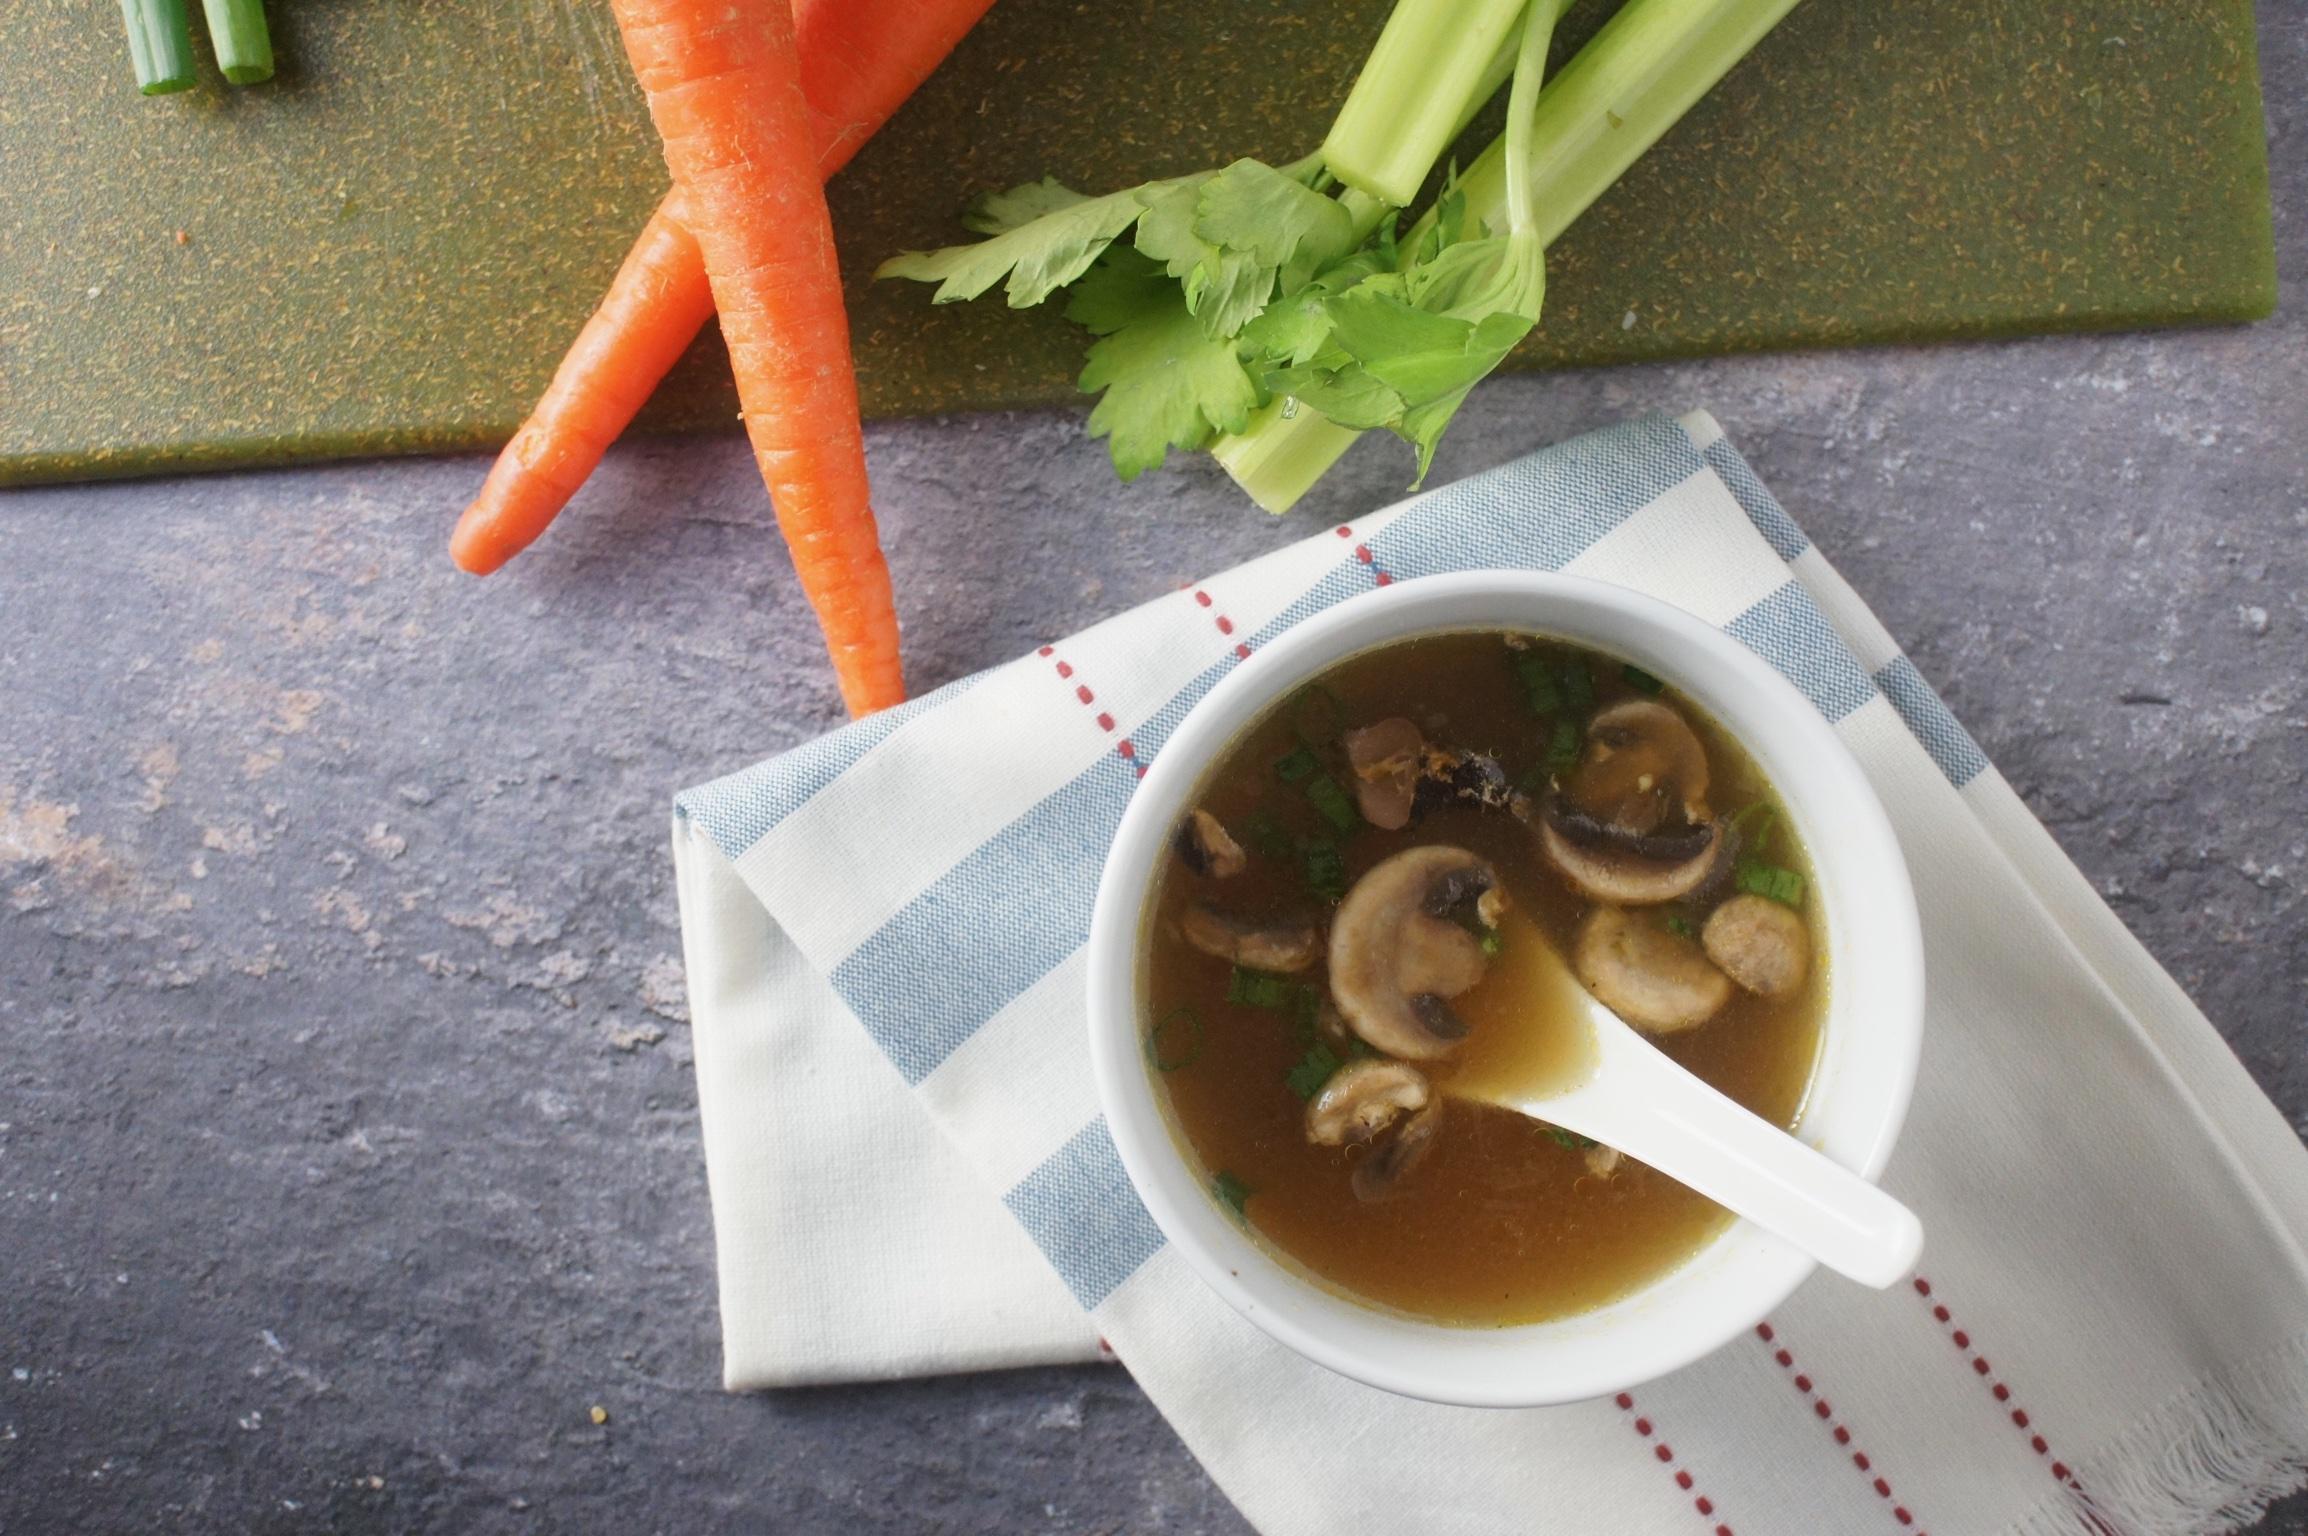 simple mushroom onion soup, soup, soup recipe, hibachi soup, mushroom onion soup, miso soup, our messy table